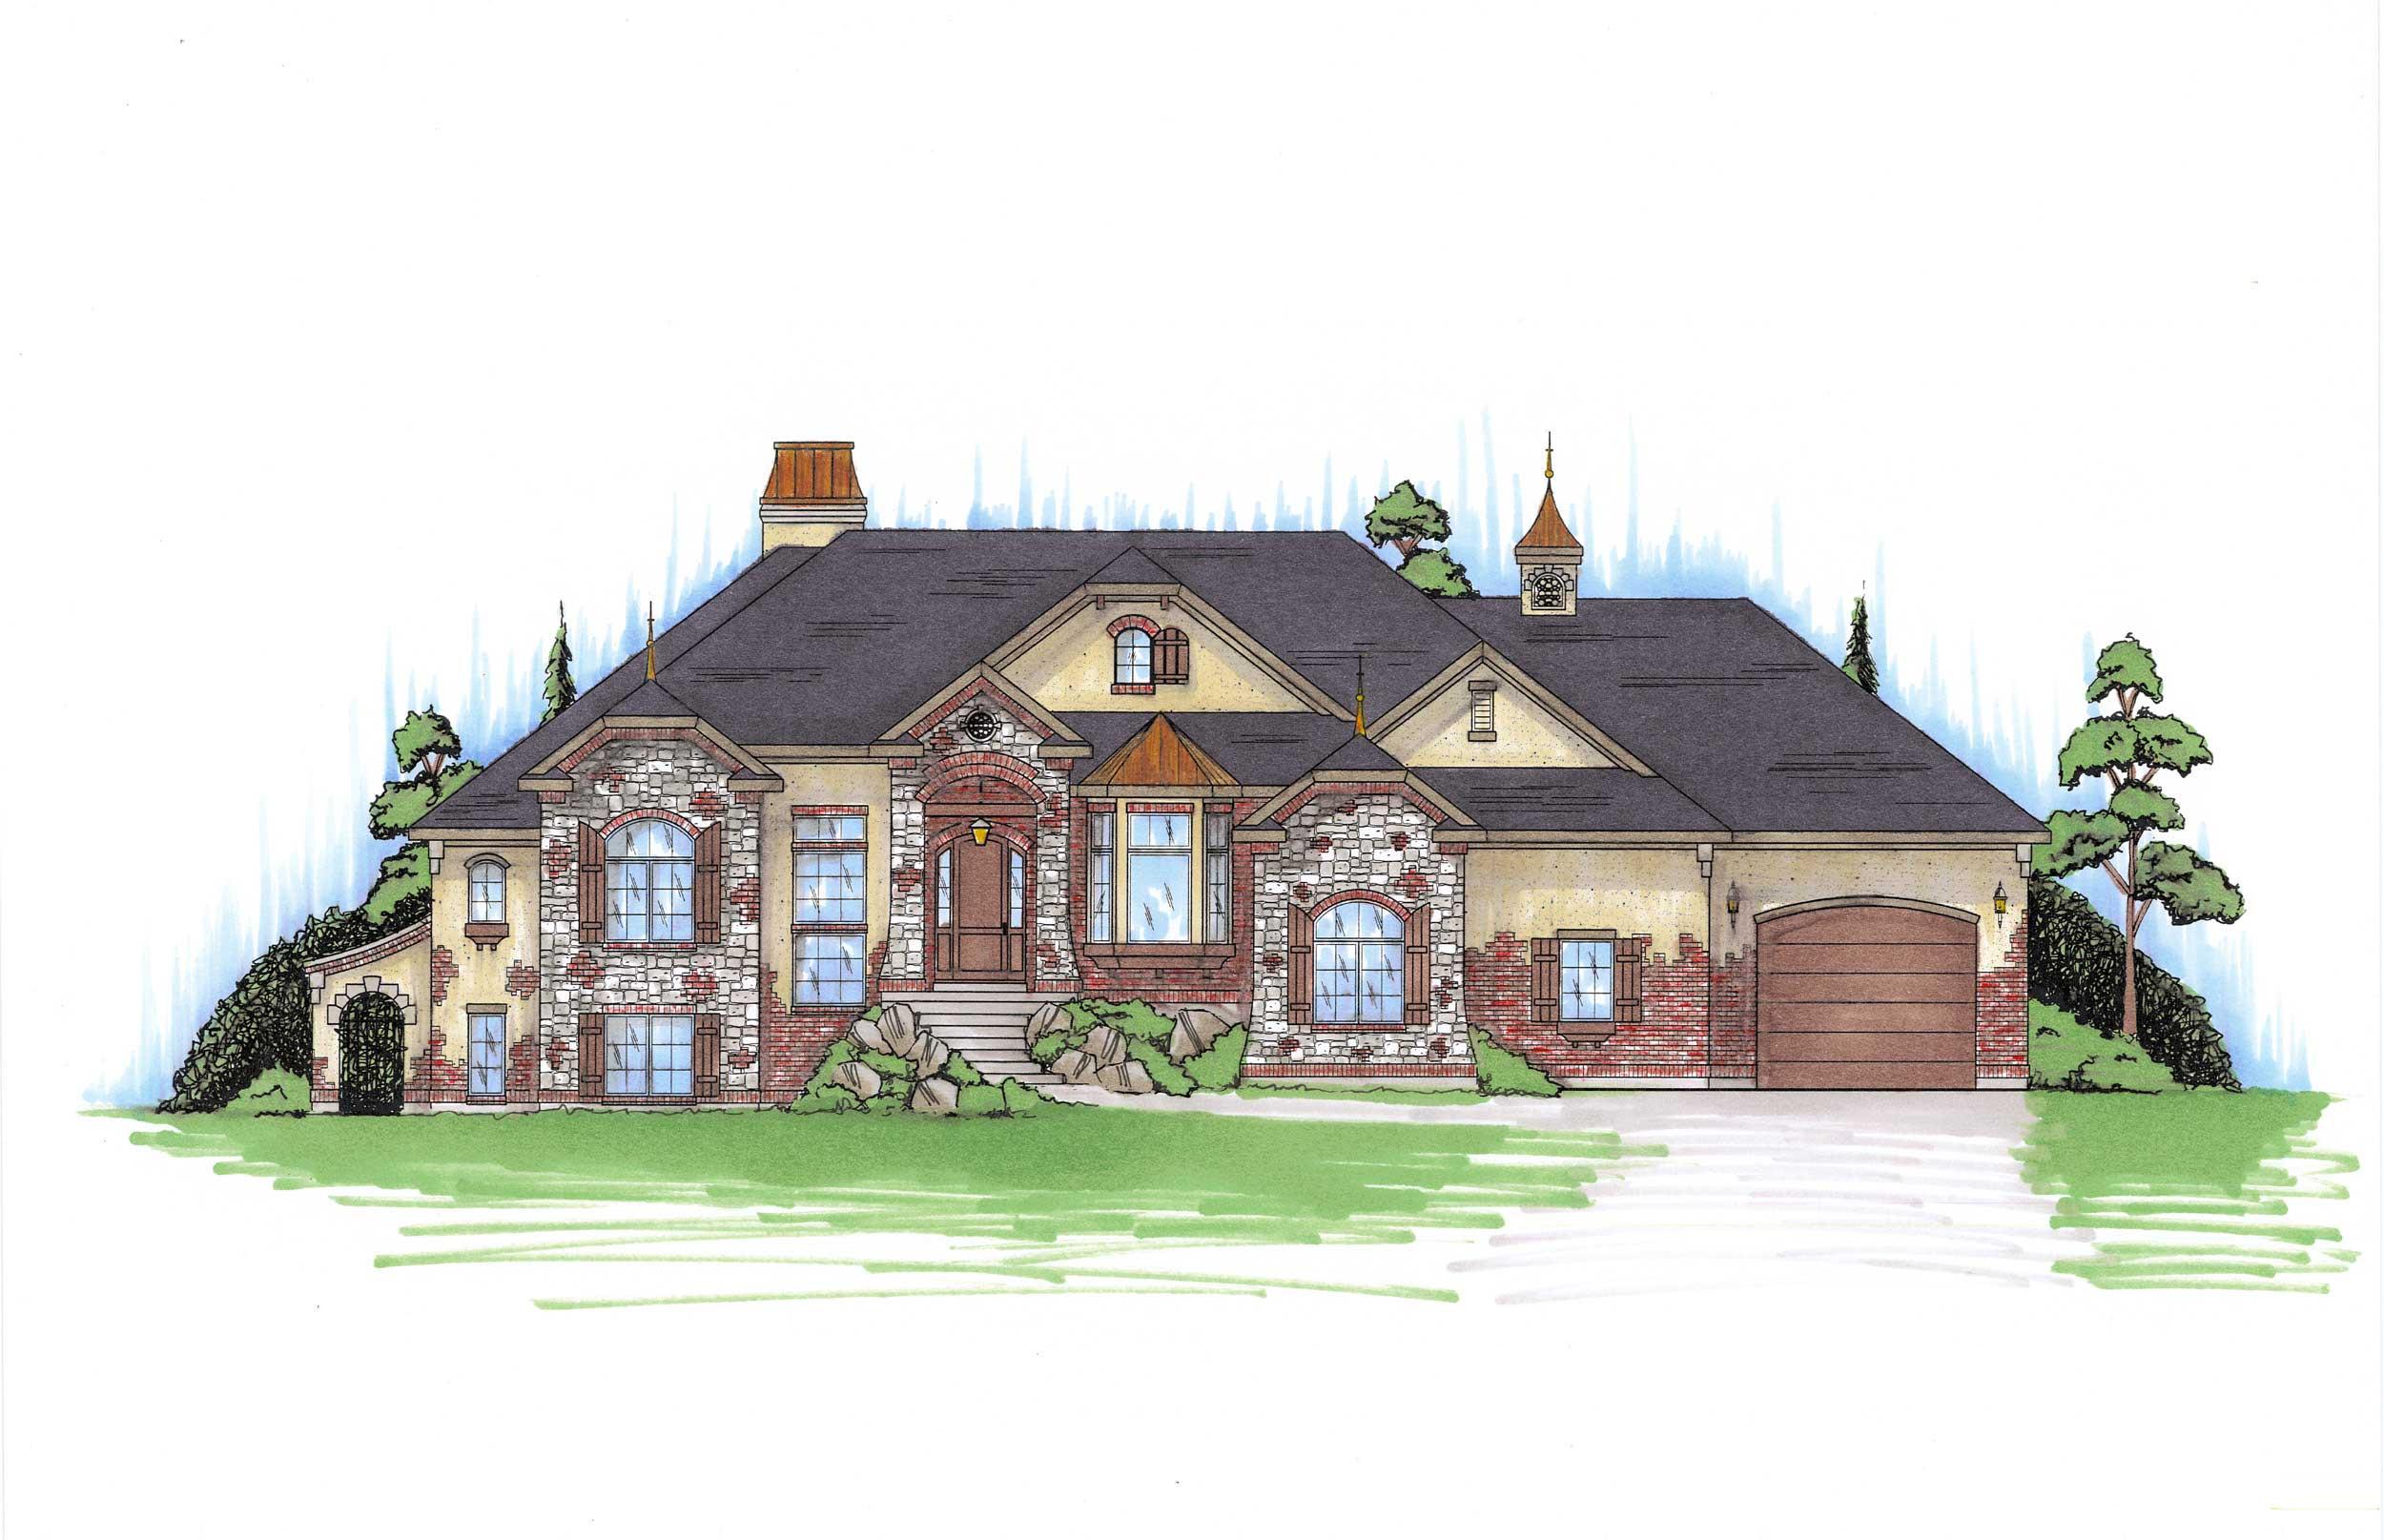 European house plans home design vh ts2866 for European home collection